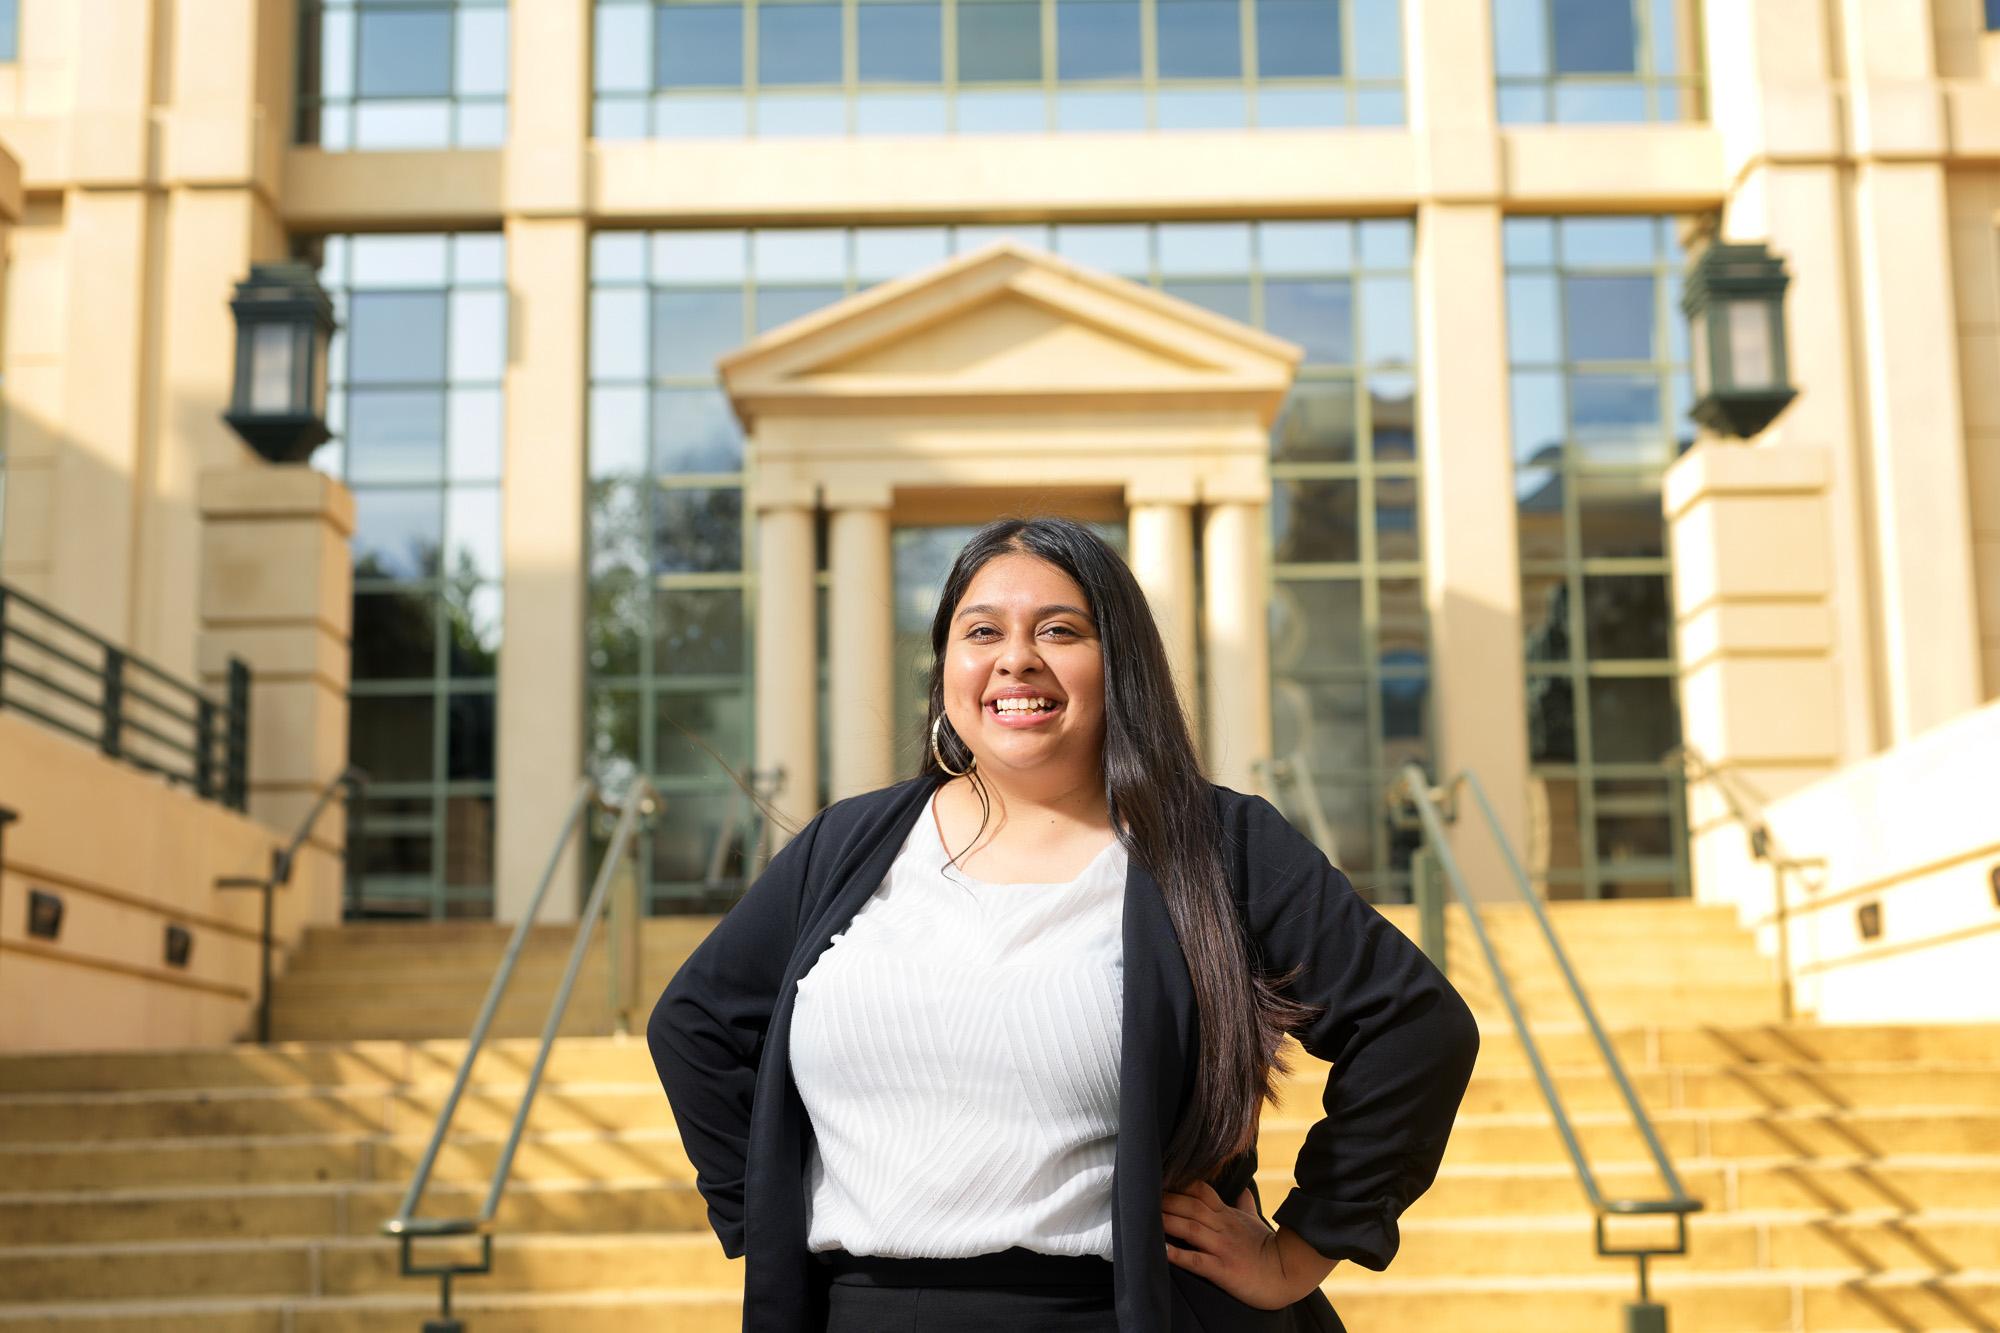 University of Iowa student Luz Alcala standing on campus